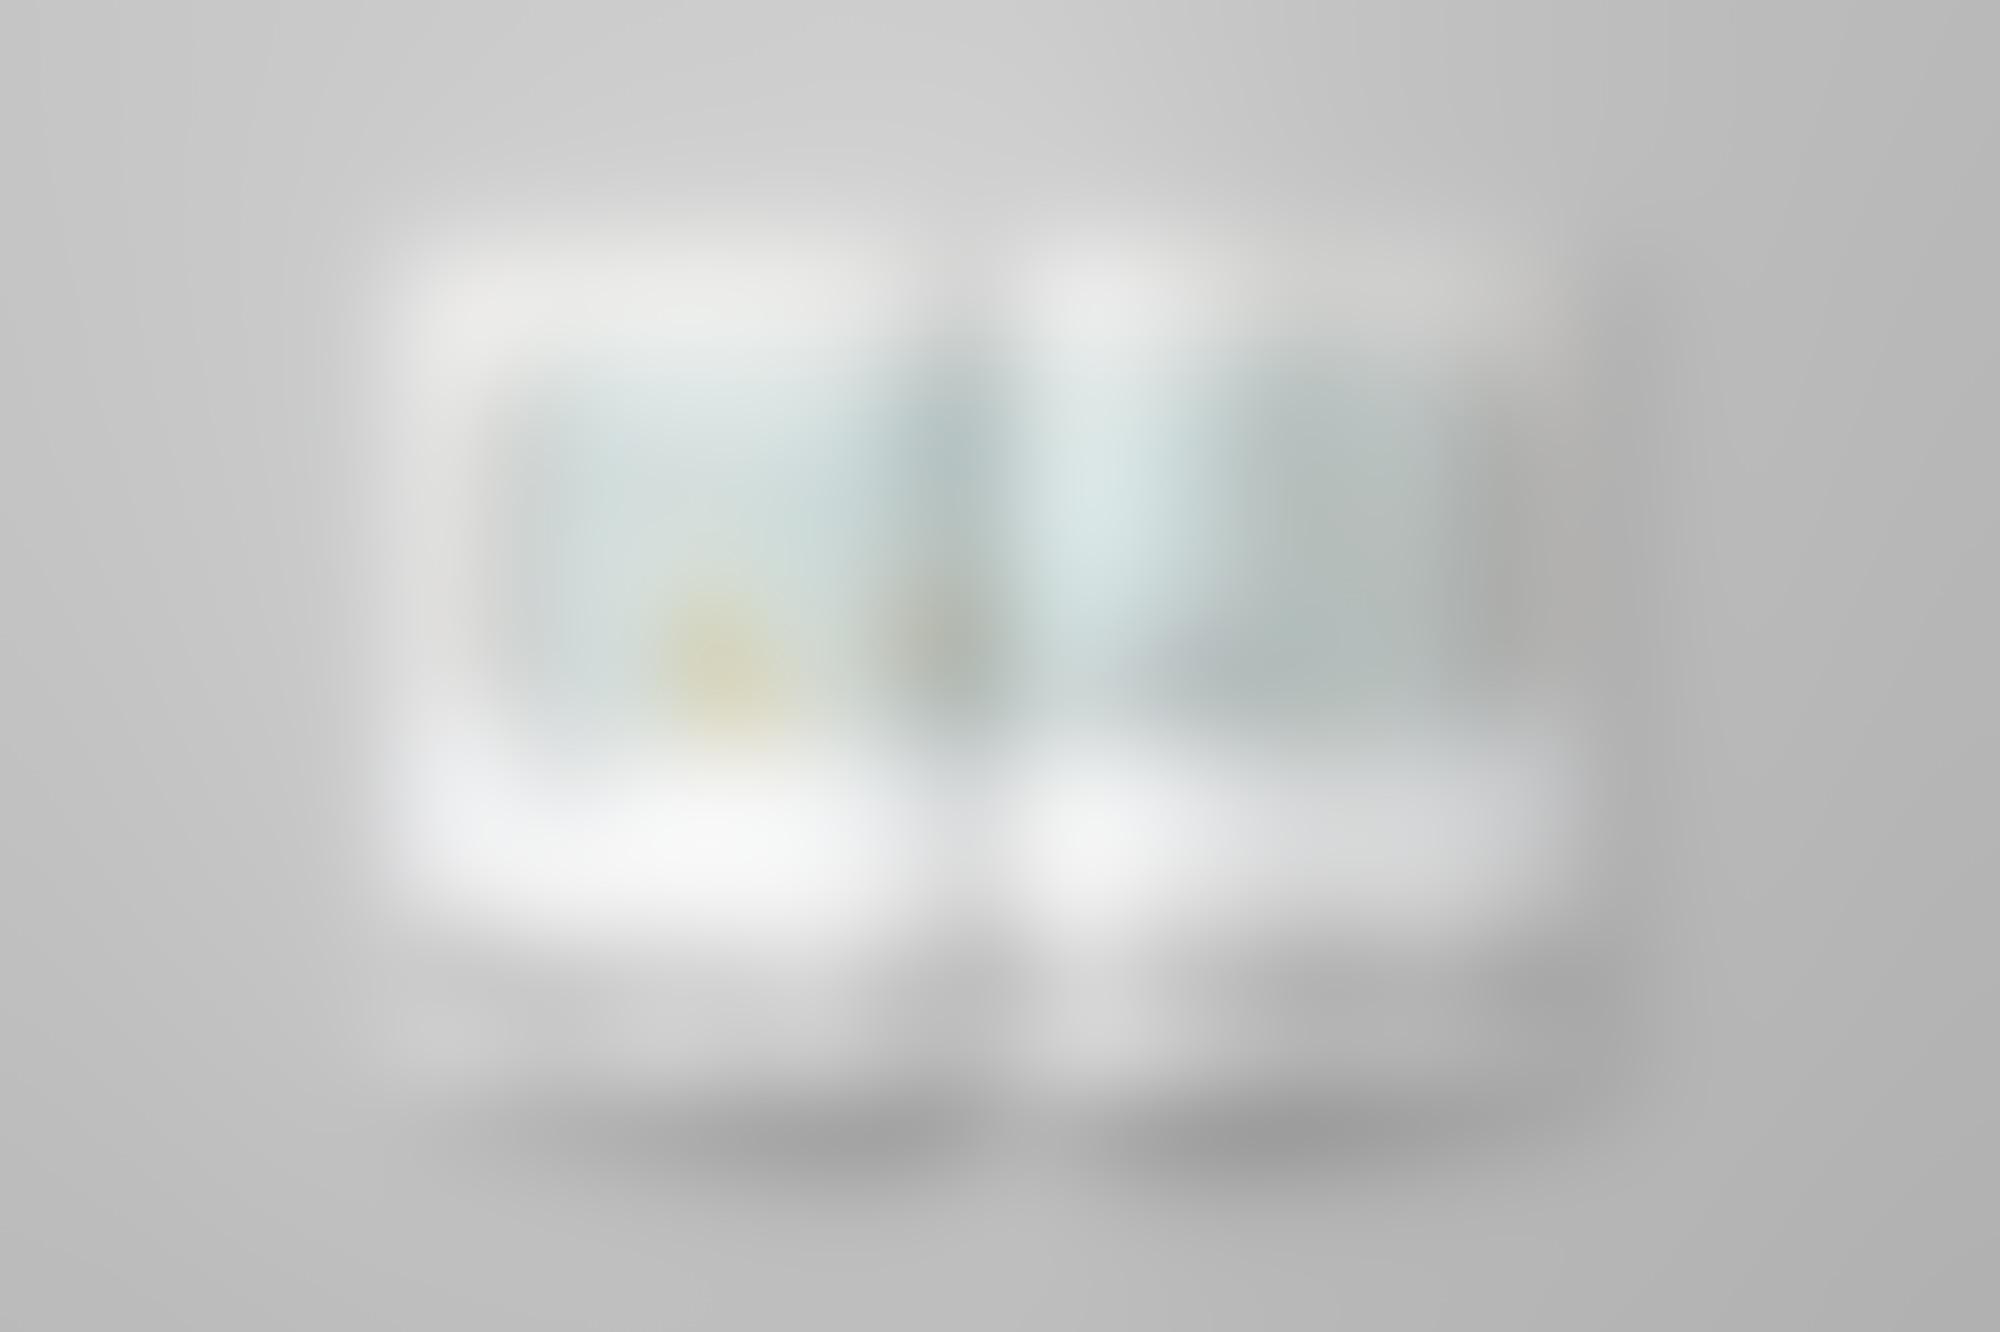 Article Imafes5 autocompressfitresizeixlibphp 1 1 0max h2000max w3 D2000q80s004a416fdd08b574342d56377f3c0f43